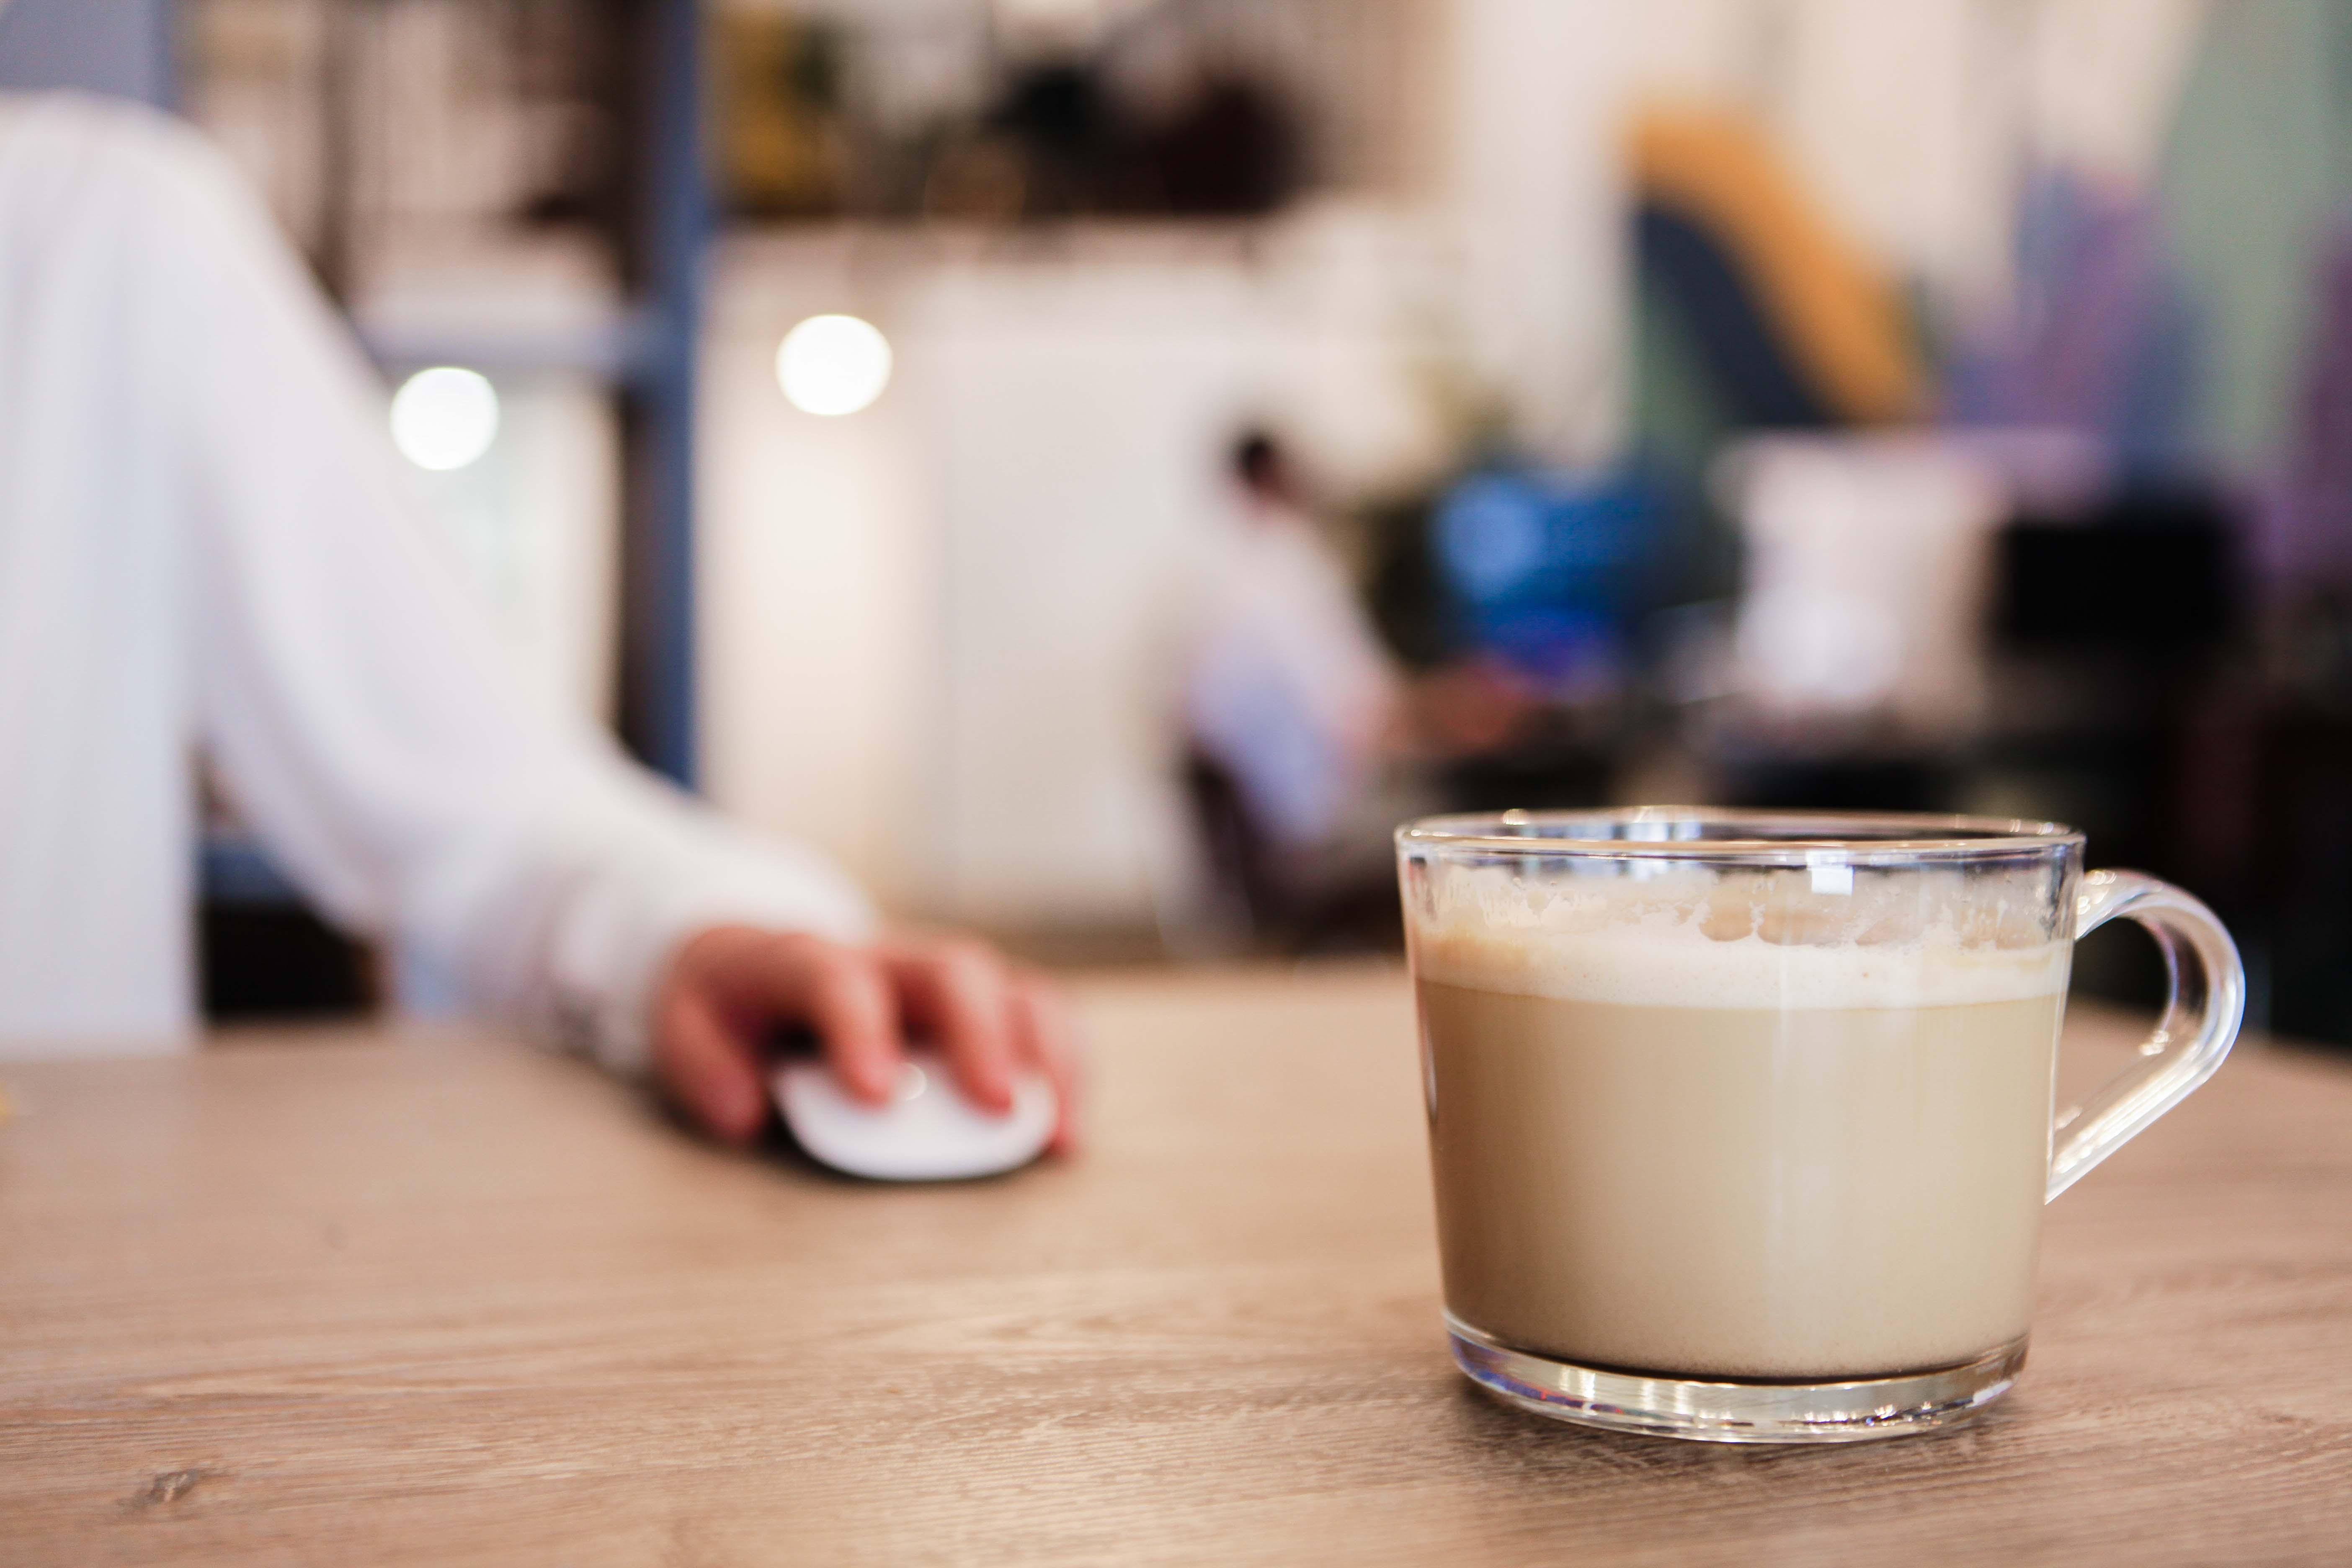 Coffee mug with an espresso in it